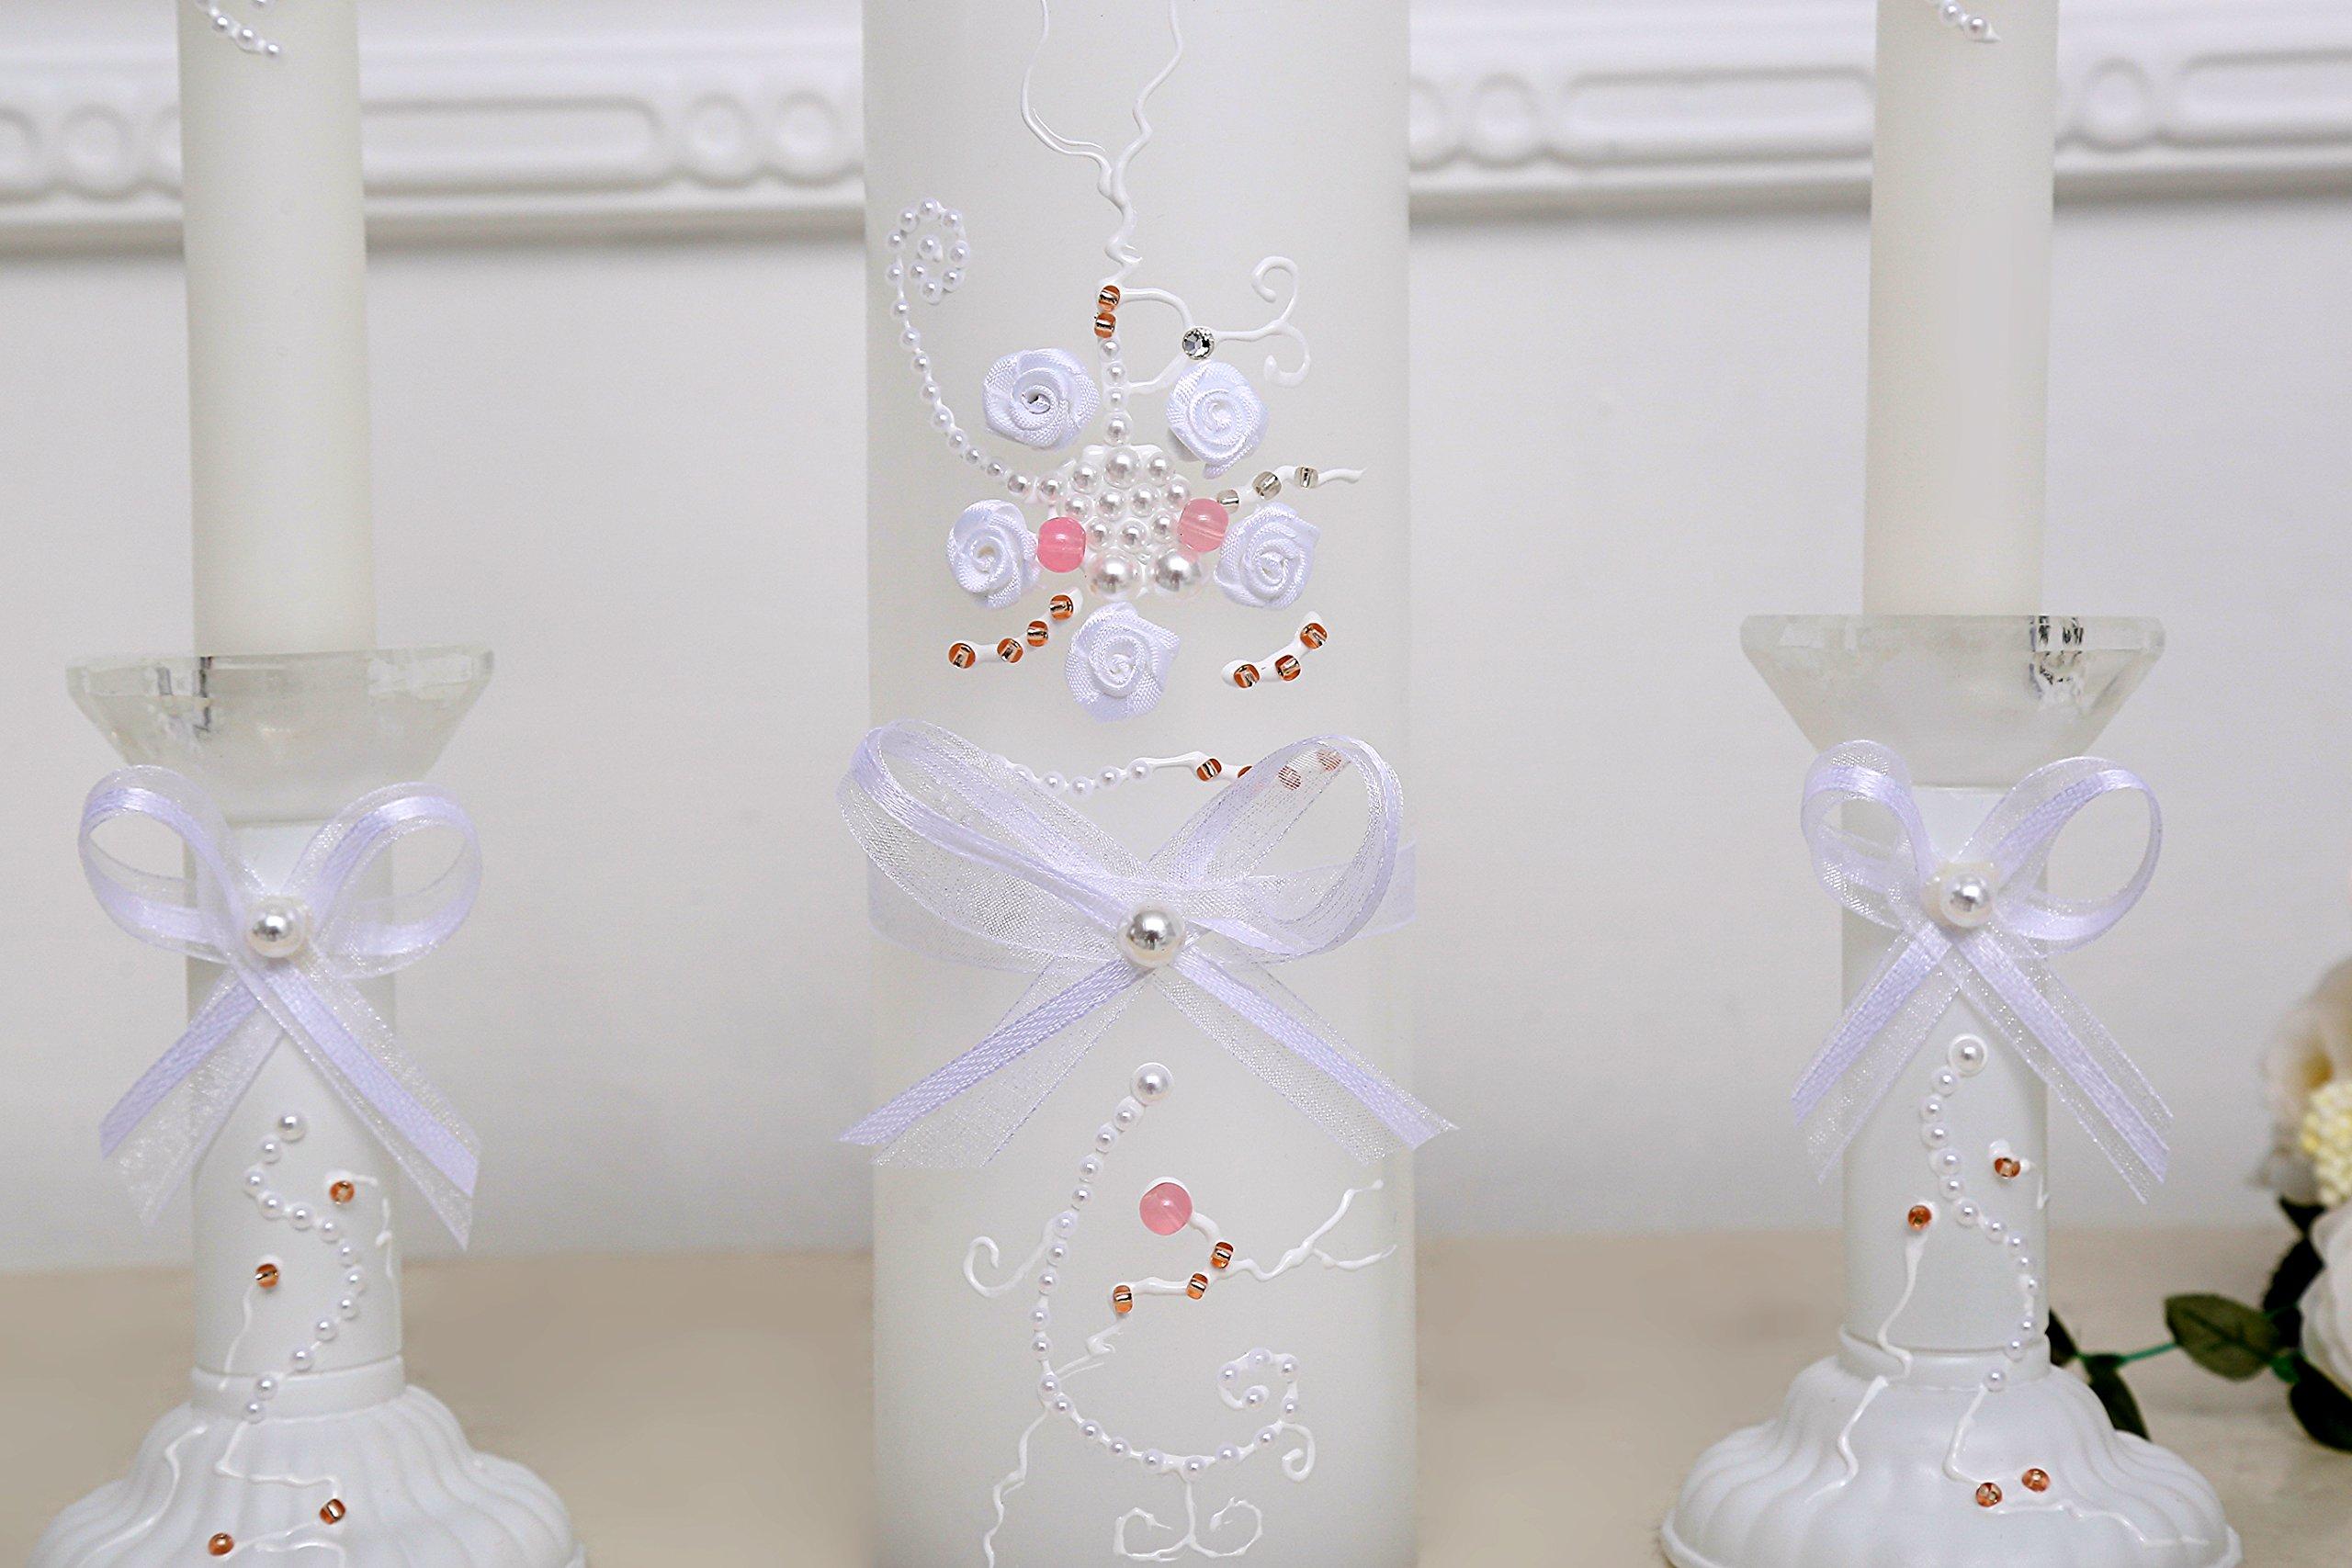 www.Beadingsupplys.com Wedding Candle Set of 3, Unity Rustic wedding Candle Rustic Ceremony Candles personalized memory candle